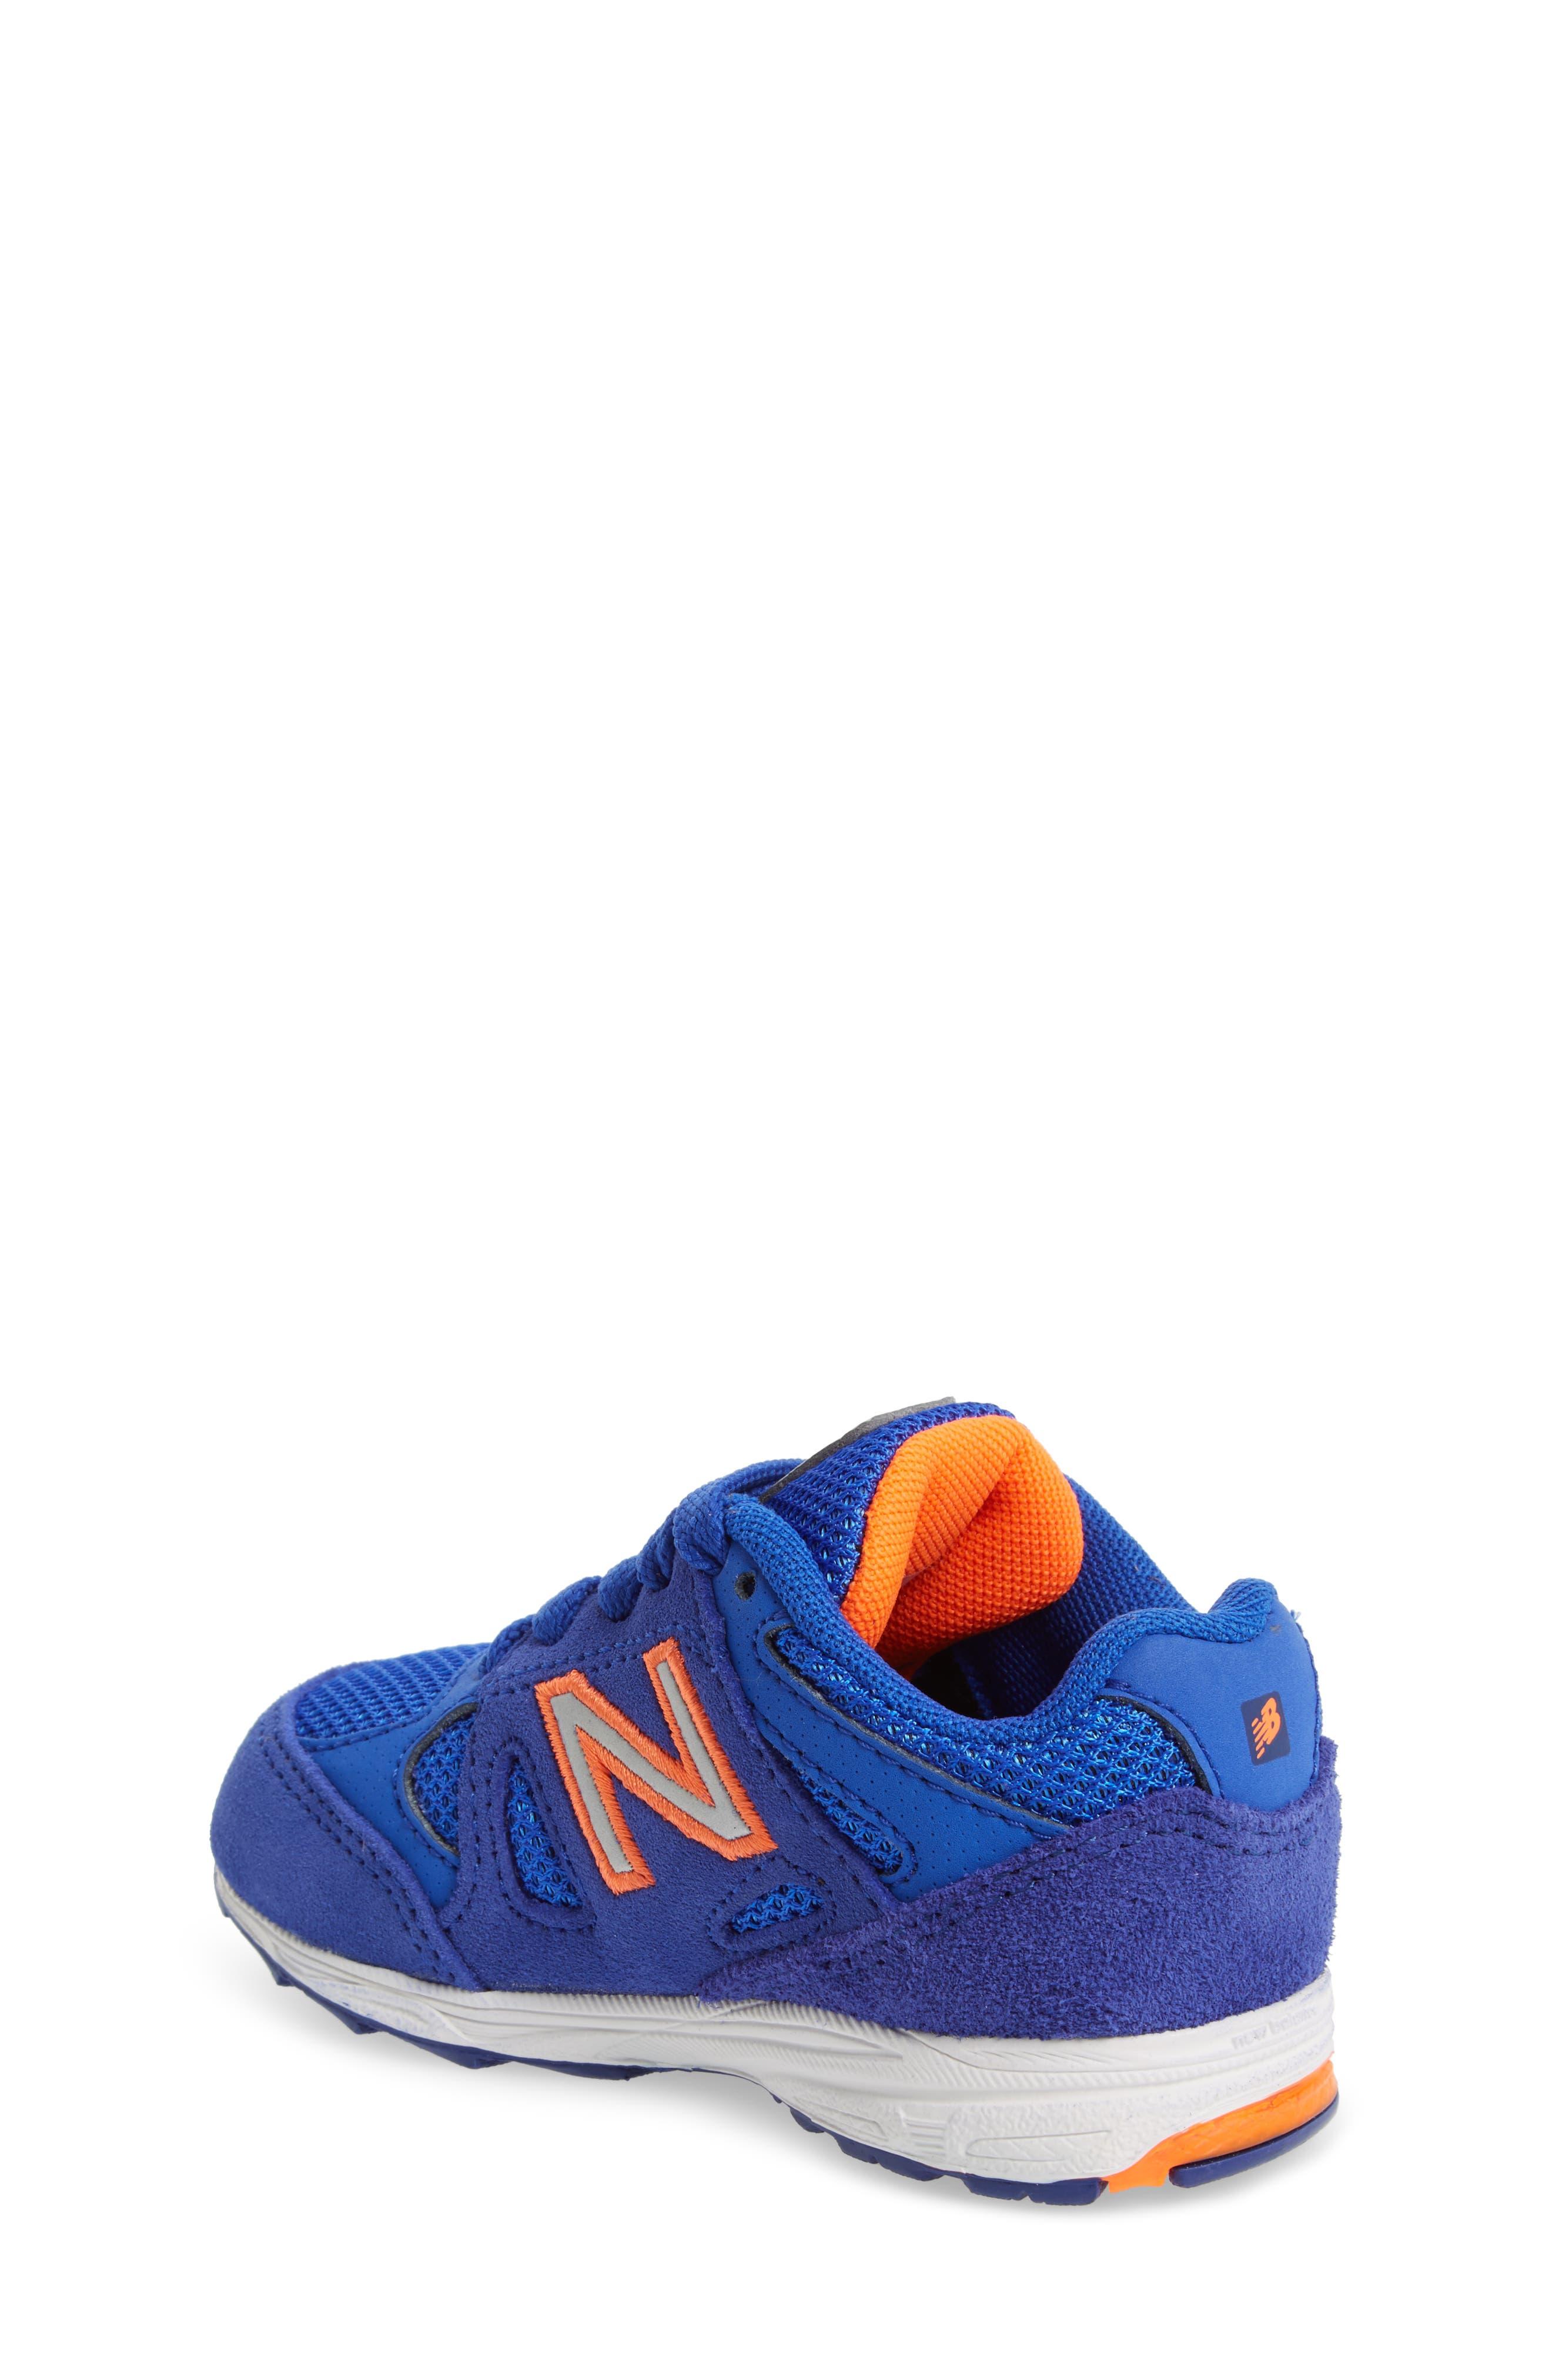 888 Sneaker,                             Alternate thumbnail 2, color,                             Pacific